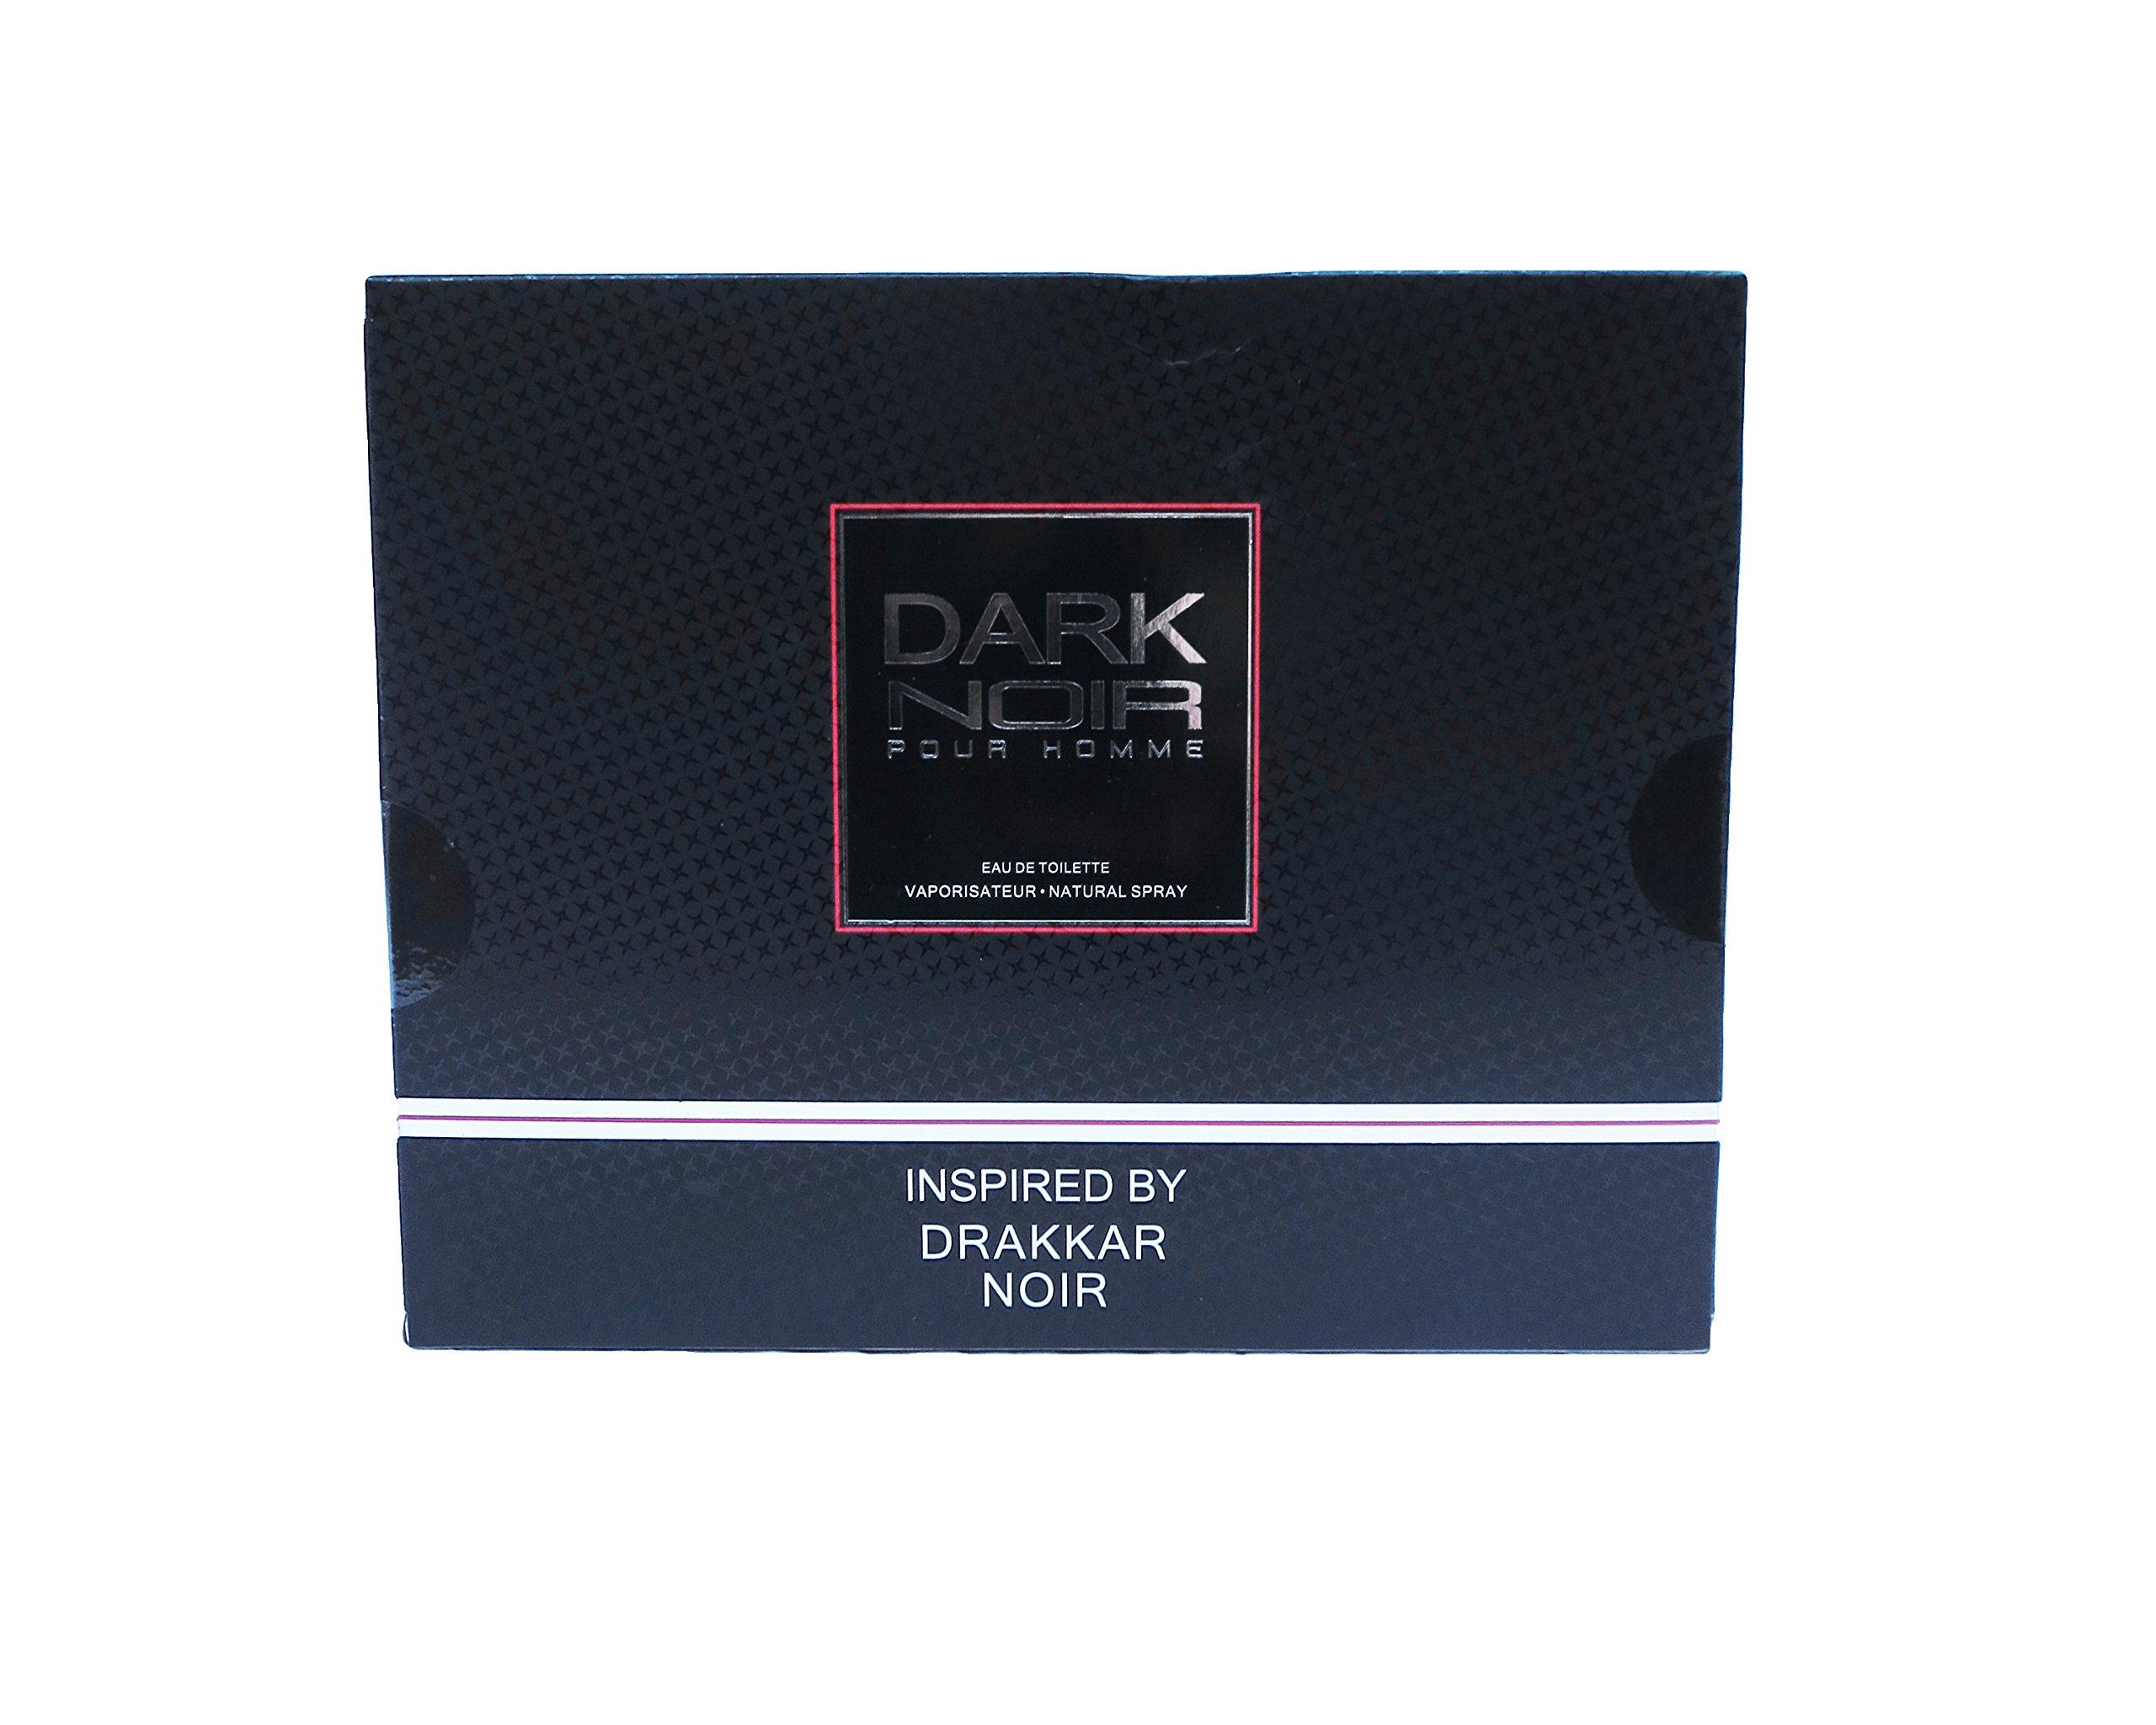 Watermark Beauty Dark Noir Men 3 Piece Fragrance Set for Men, Includes 1.7 Oz Eau De Toilette, 2.7 Oz After Shave, and 2.7 Oz Shower Gel by Watermark Beauty